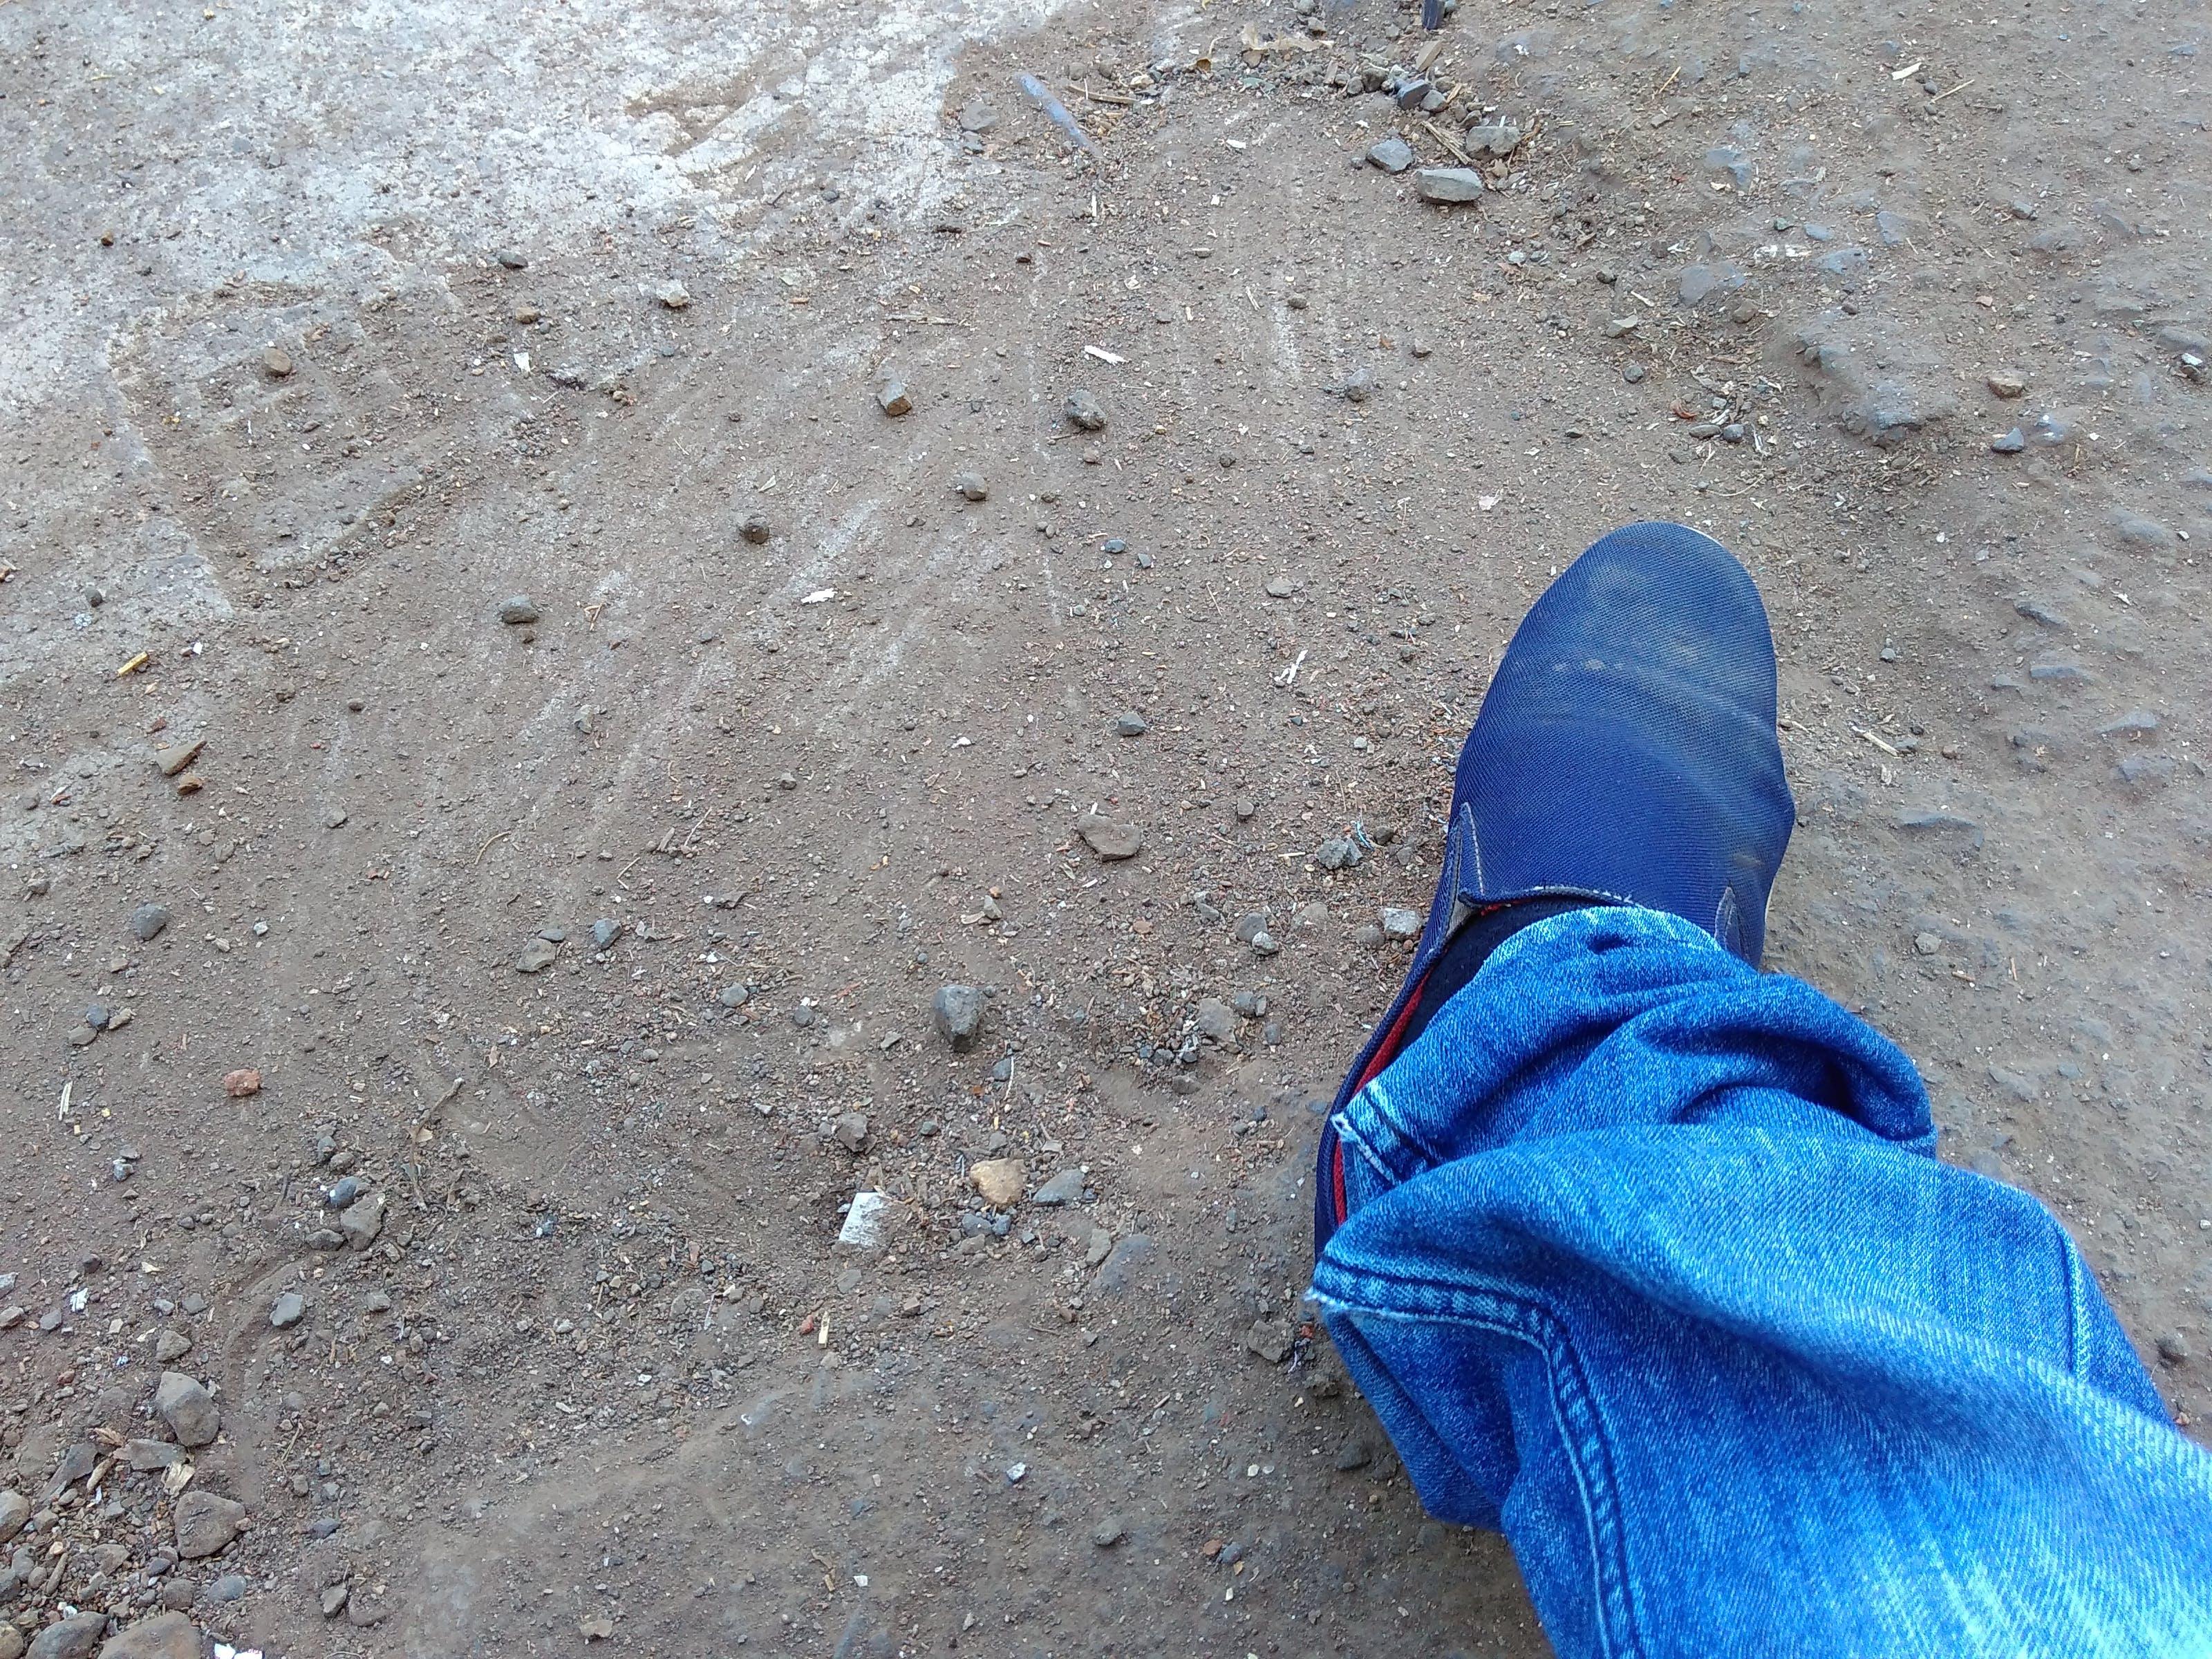 blue jeans, mud, road